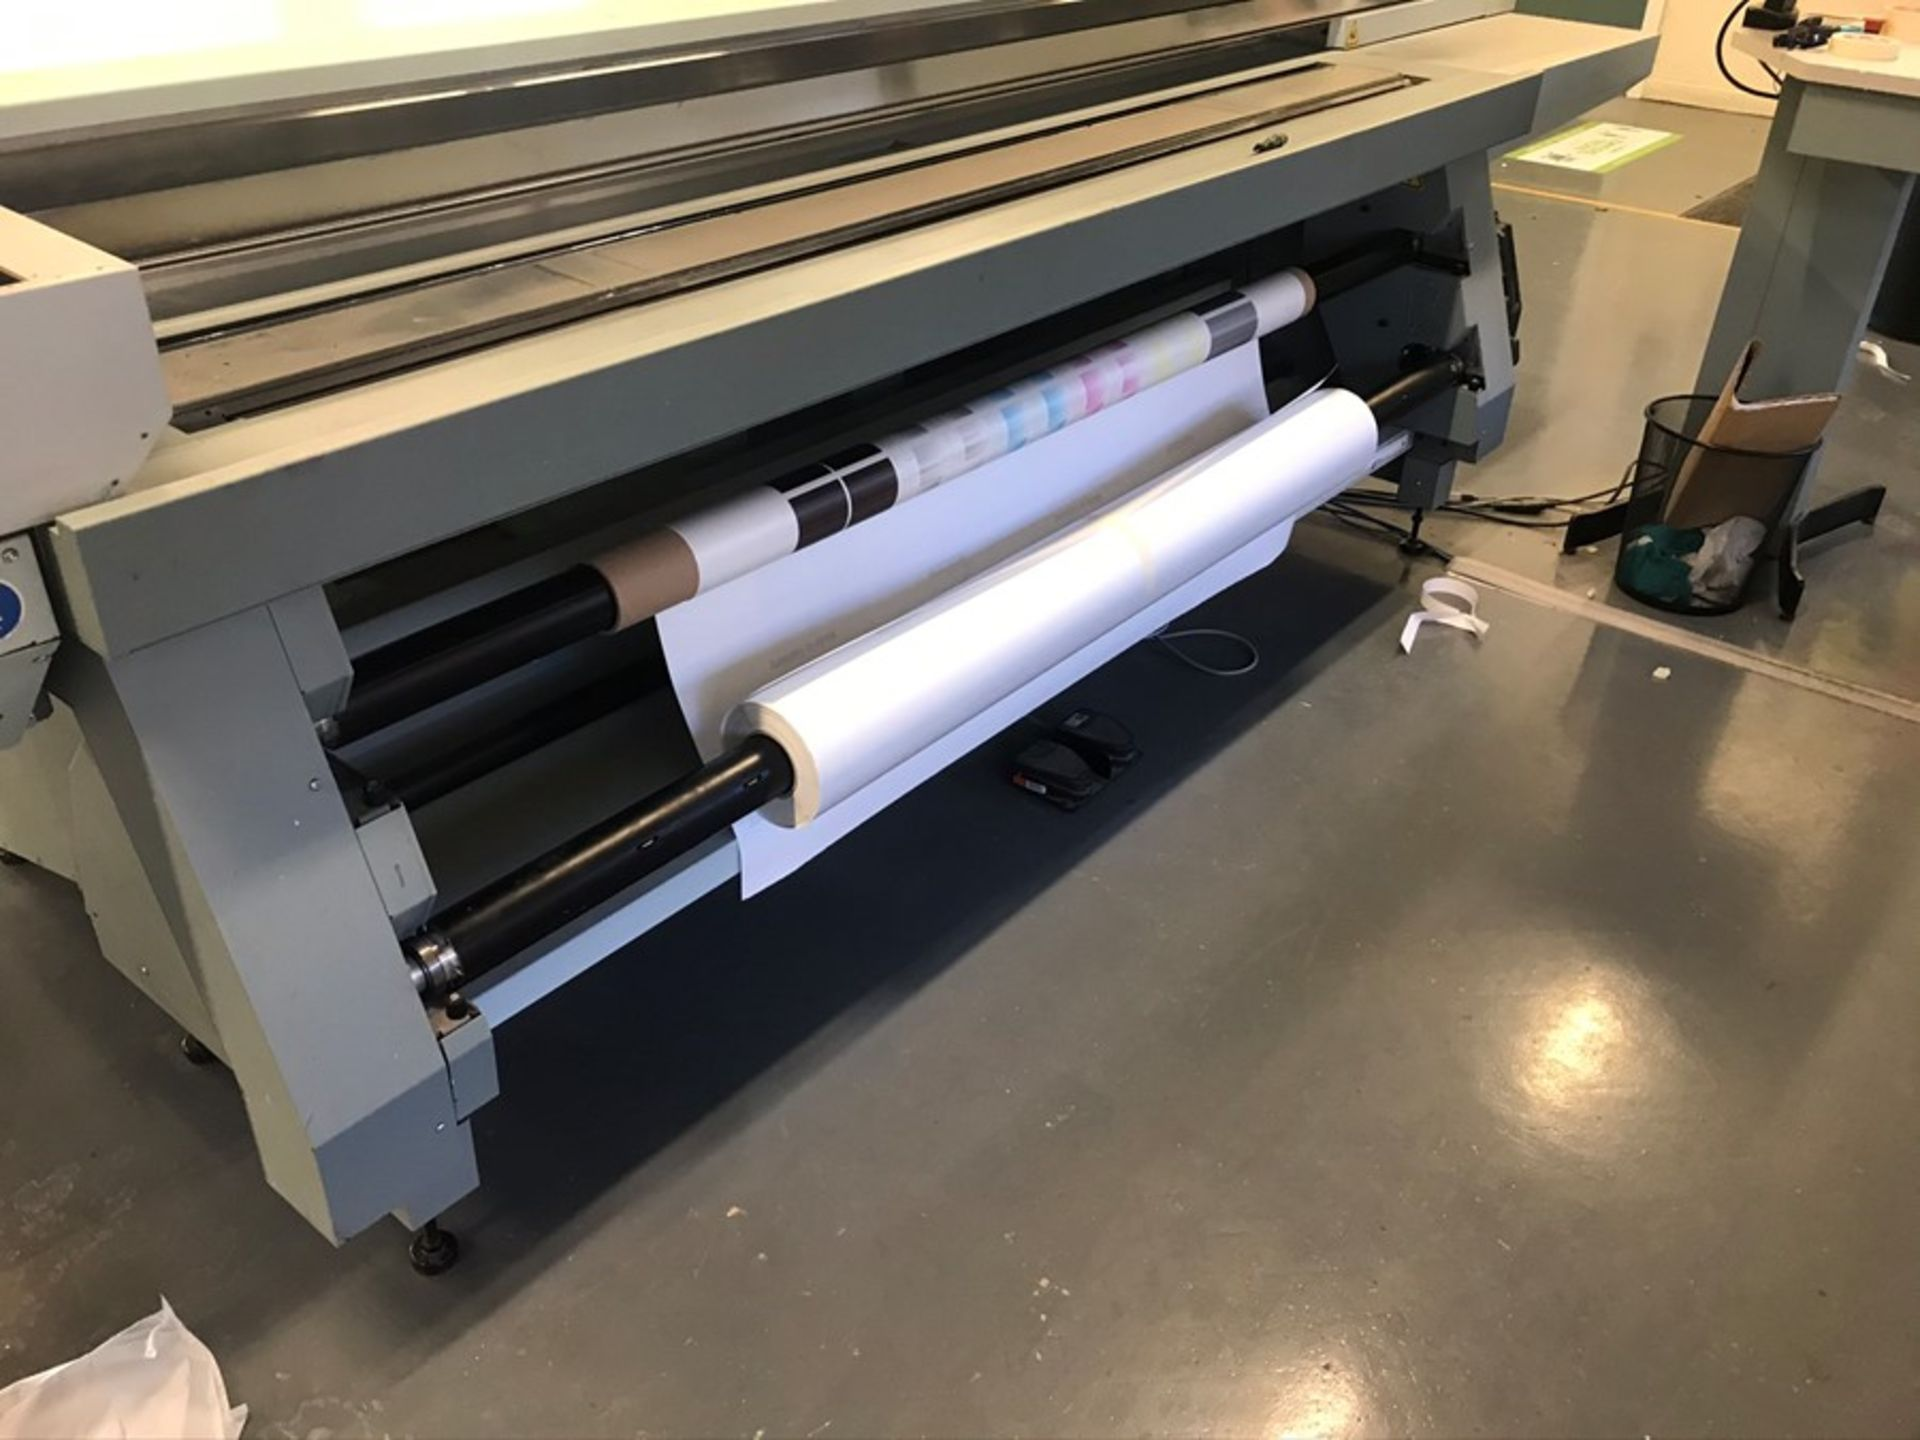 Oce Arizona 550XT + WIO UV flatbed printer (2013) - Image 14 of 22